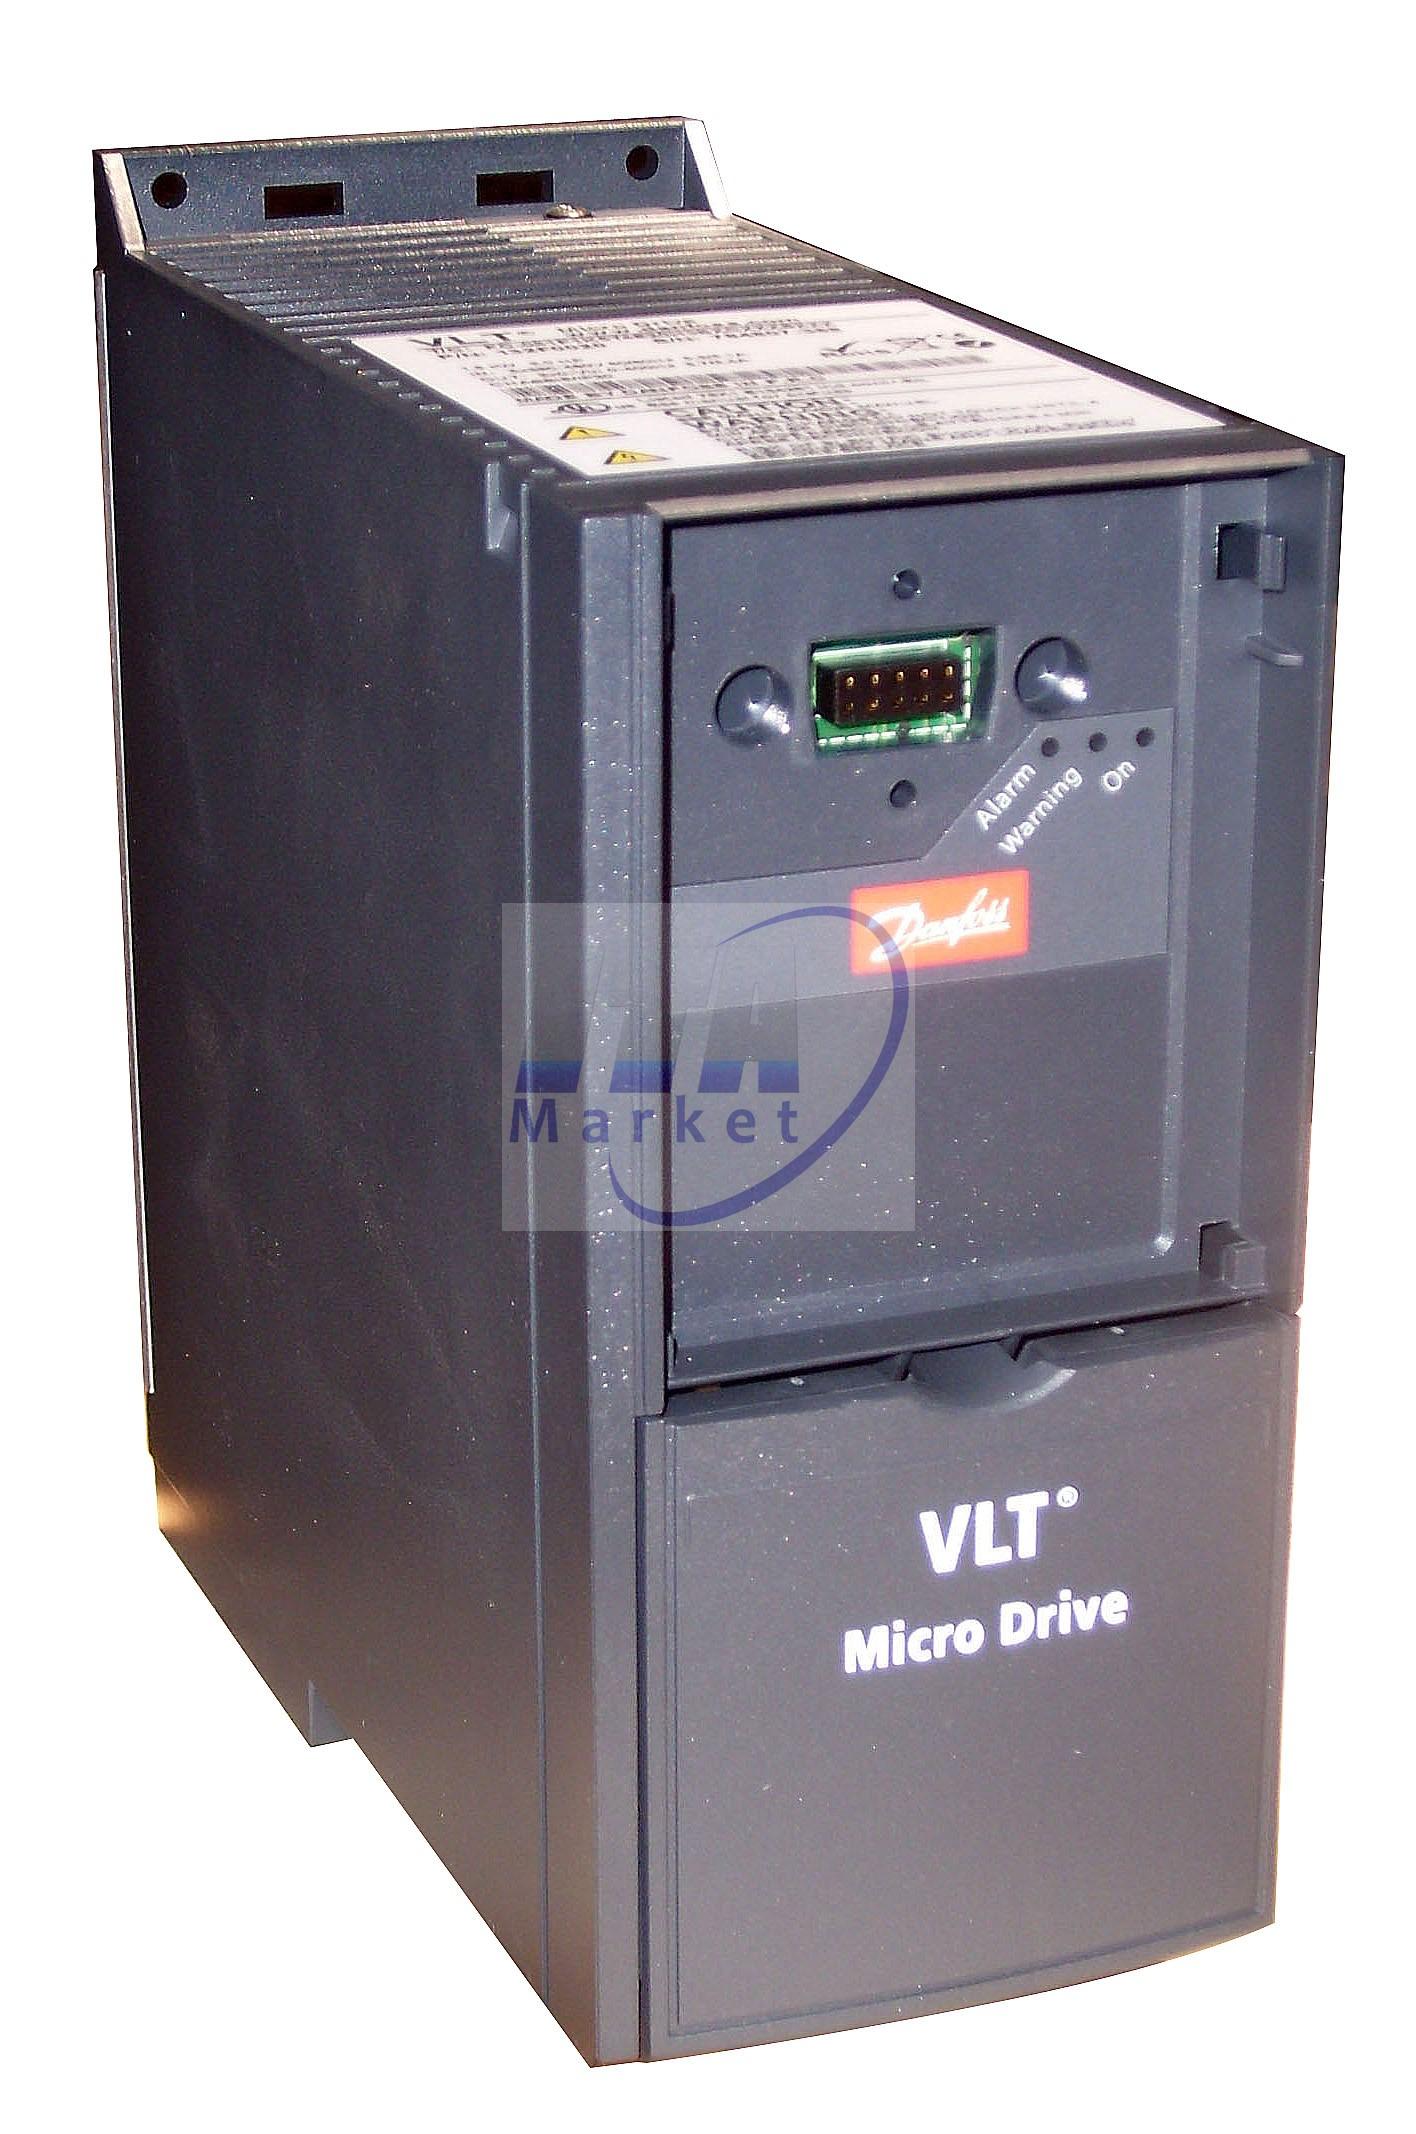 VARIADOR DE FRECUENCIA DANFOSS 380VAC_MOD.VLT-2855_ 5.5KW-7_5HP